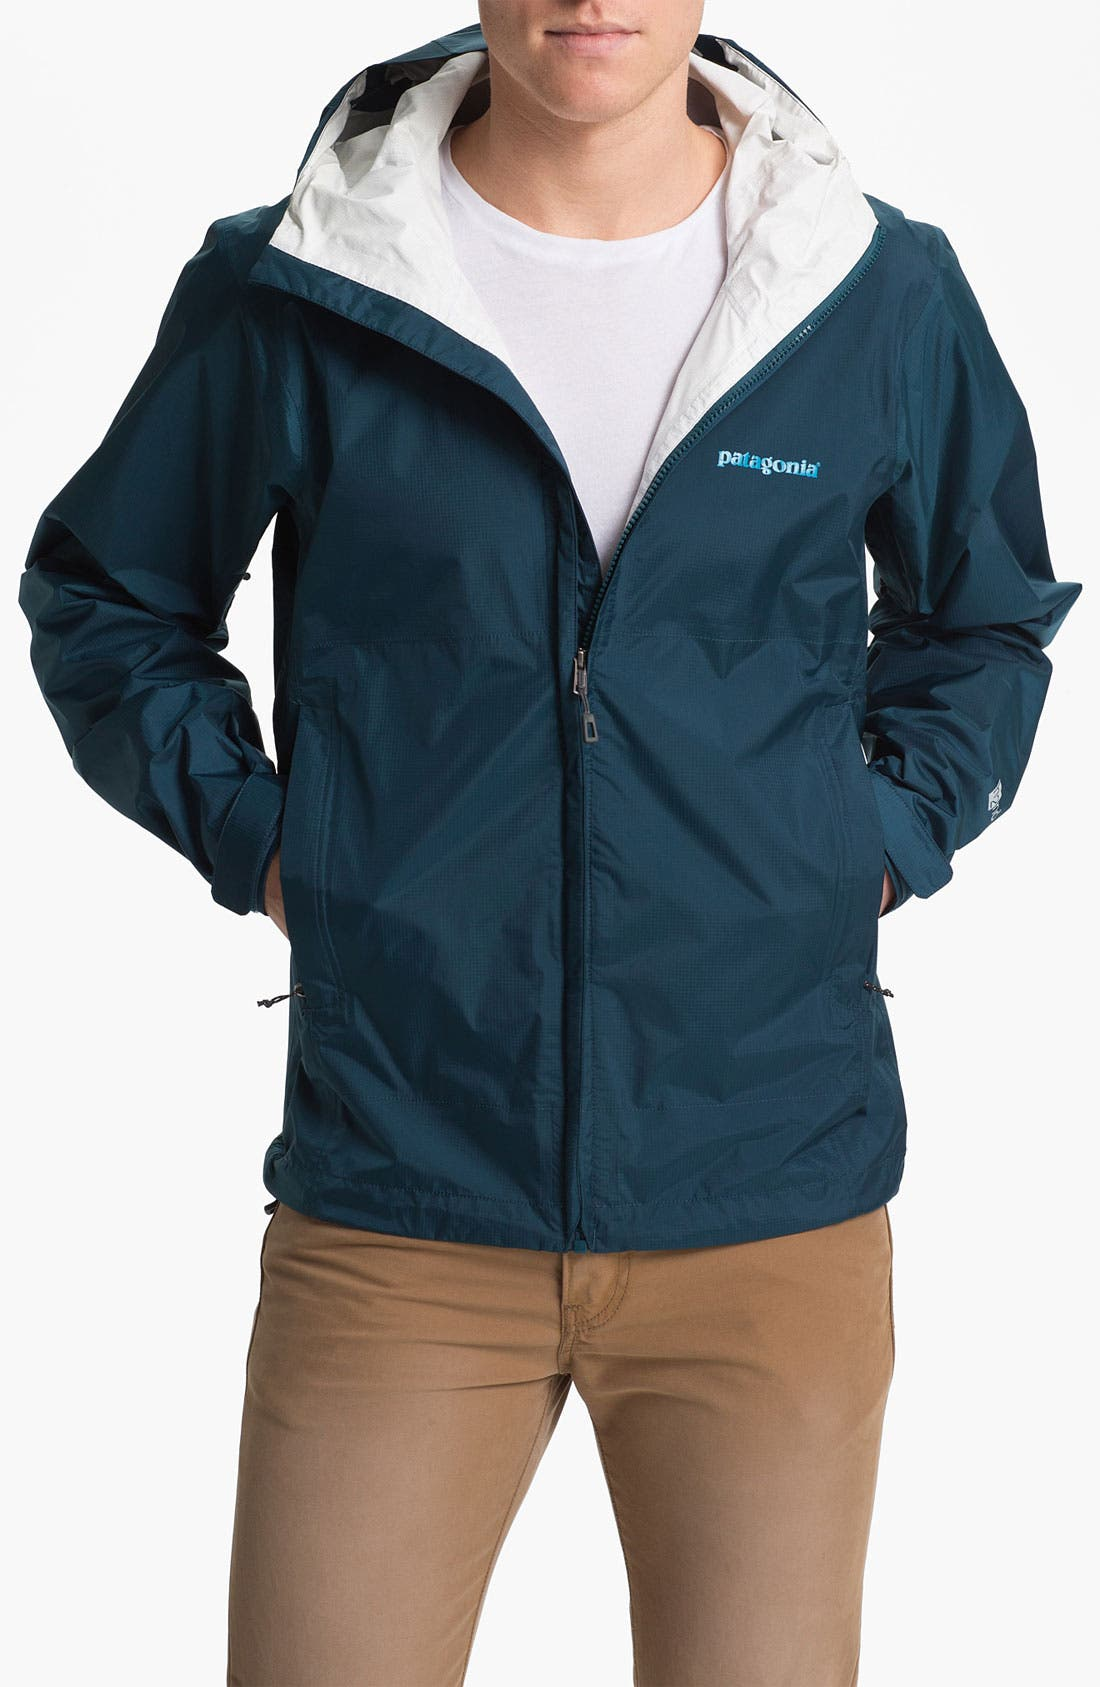 Main Image - Patagonia 'Torrentshell' Packable Rain Jacket